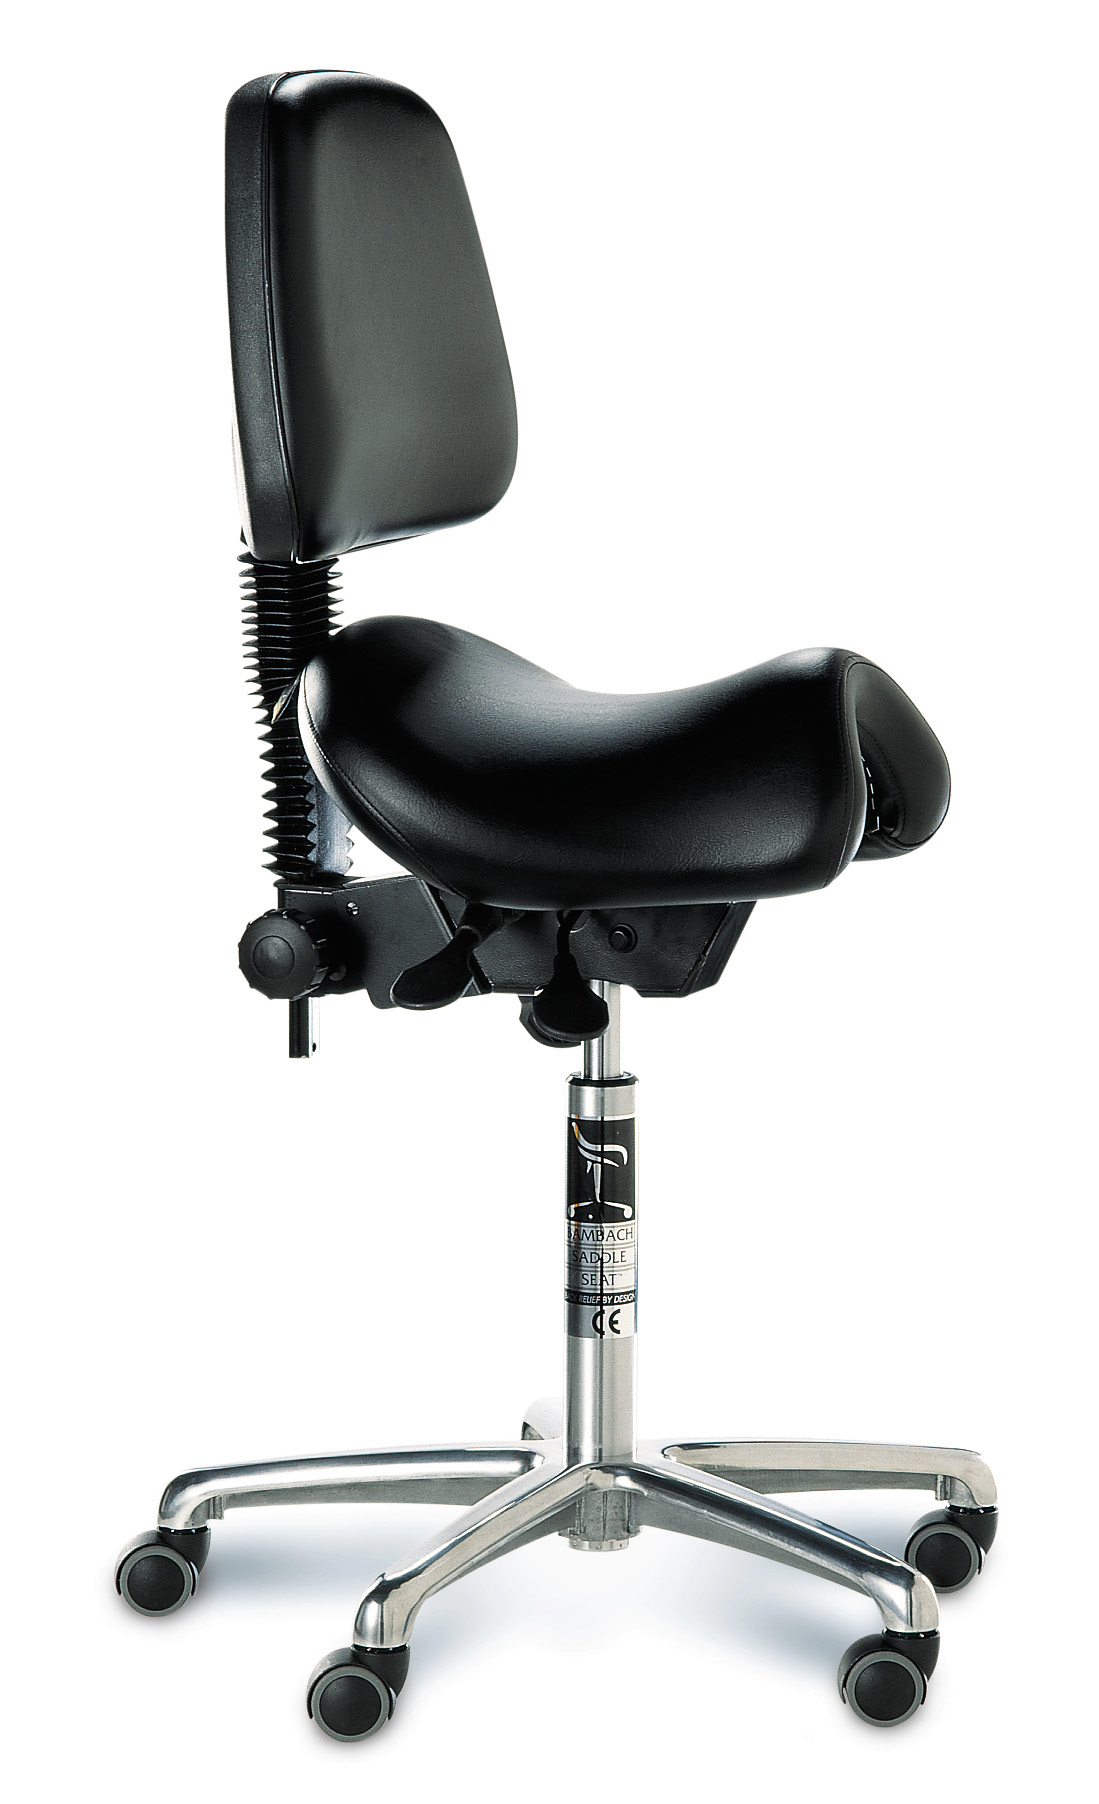 silla con respaldo